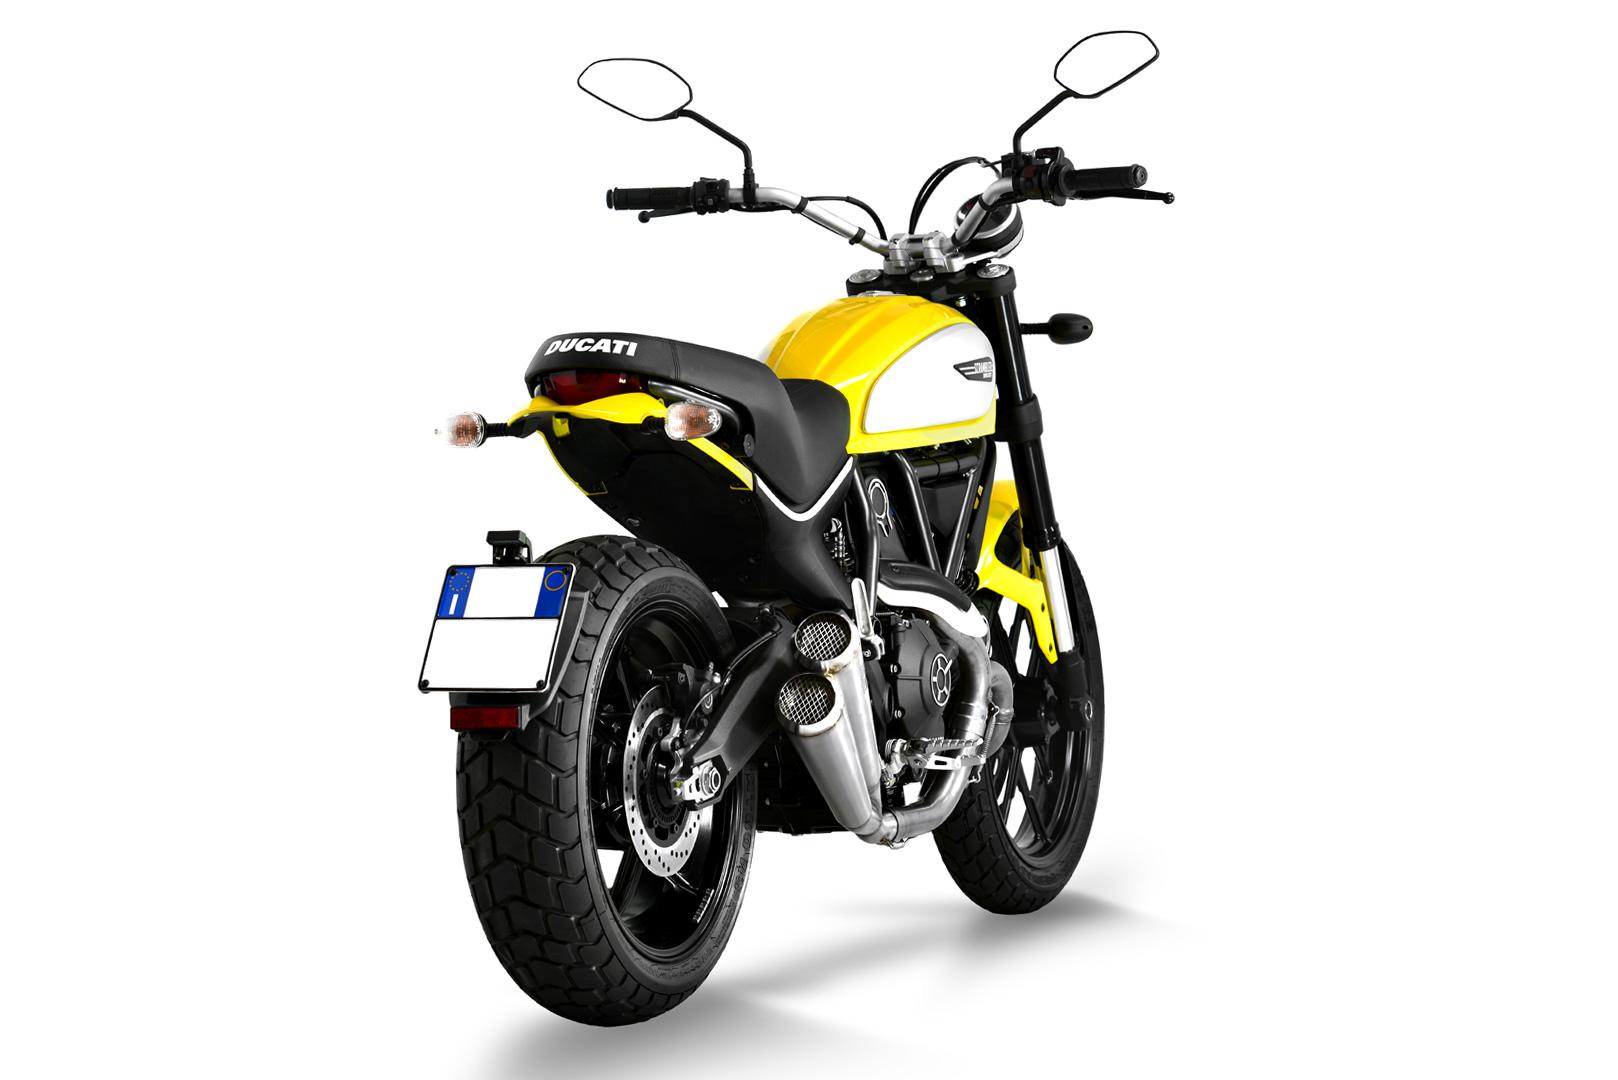 UNLEAD PHOTOGRAPHY | Ducati Scrambler, SC Project